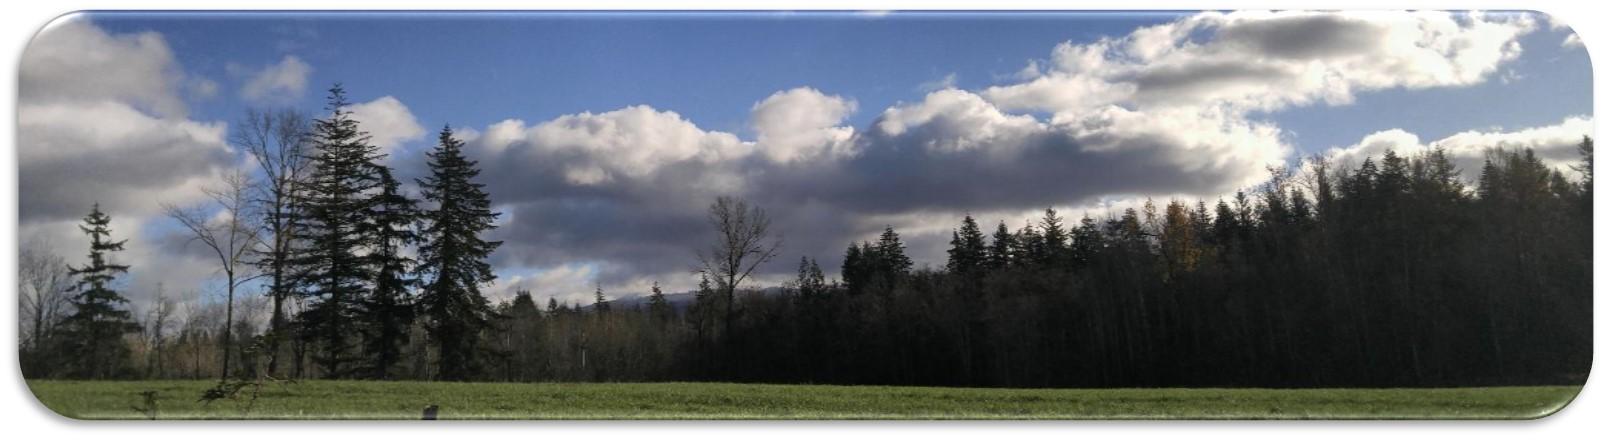 RestoreProcess_countryside.jpg